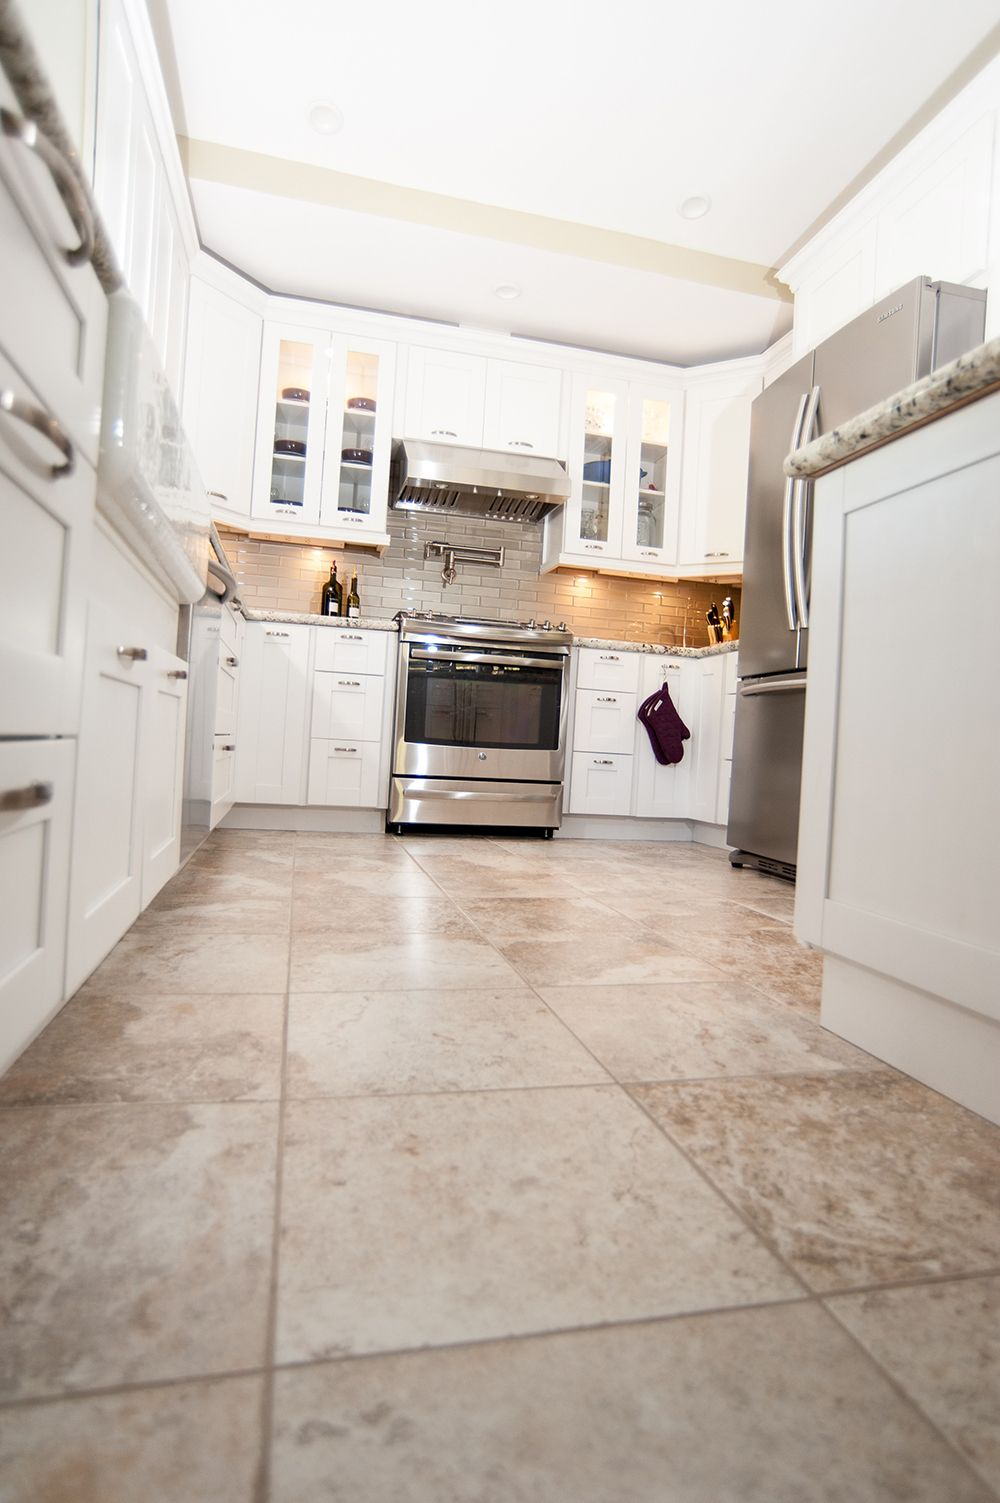 beautiful tan tile floors to match the